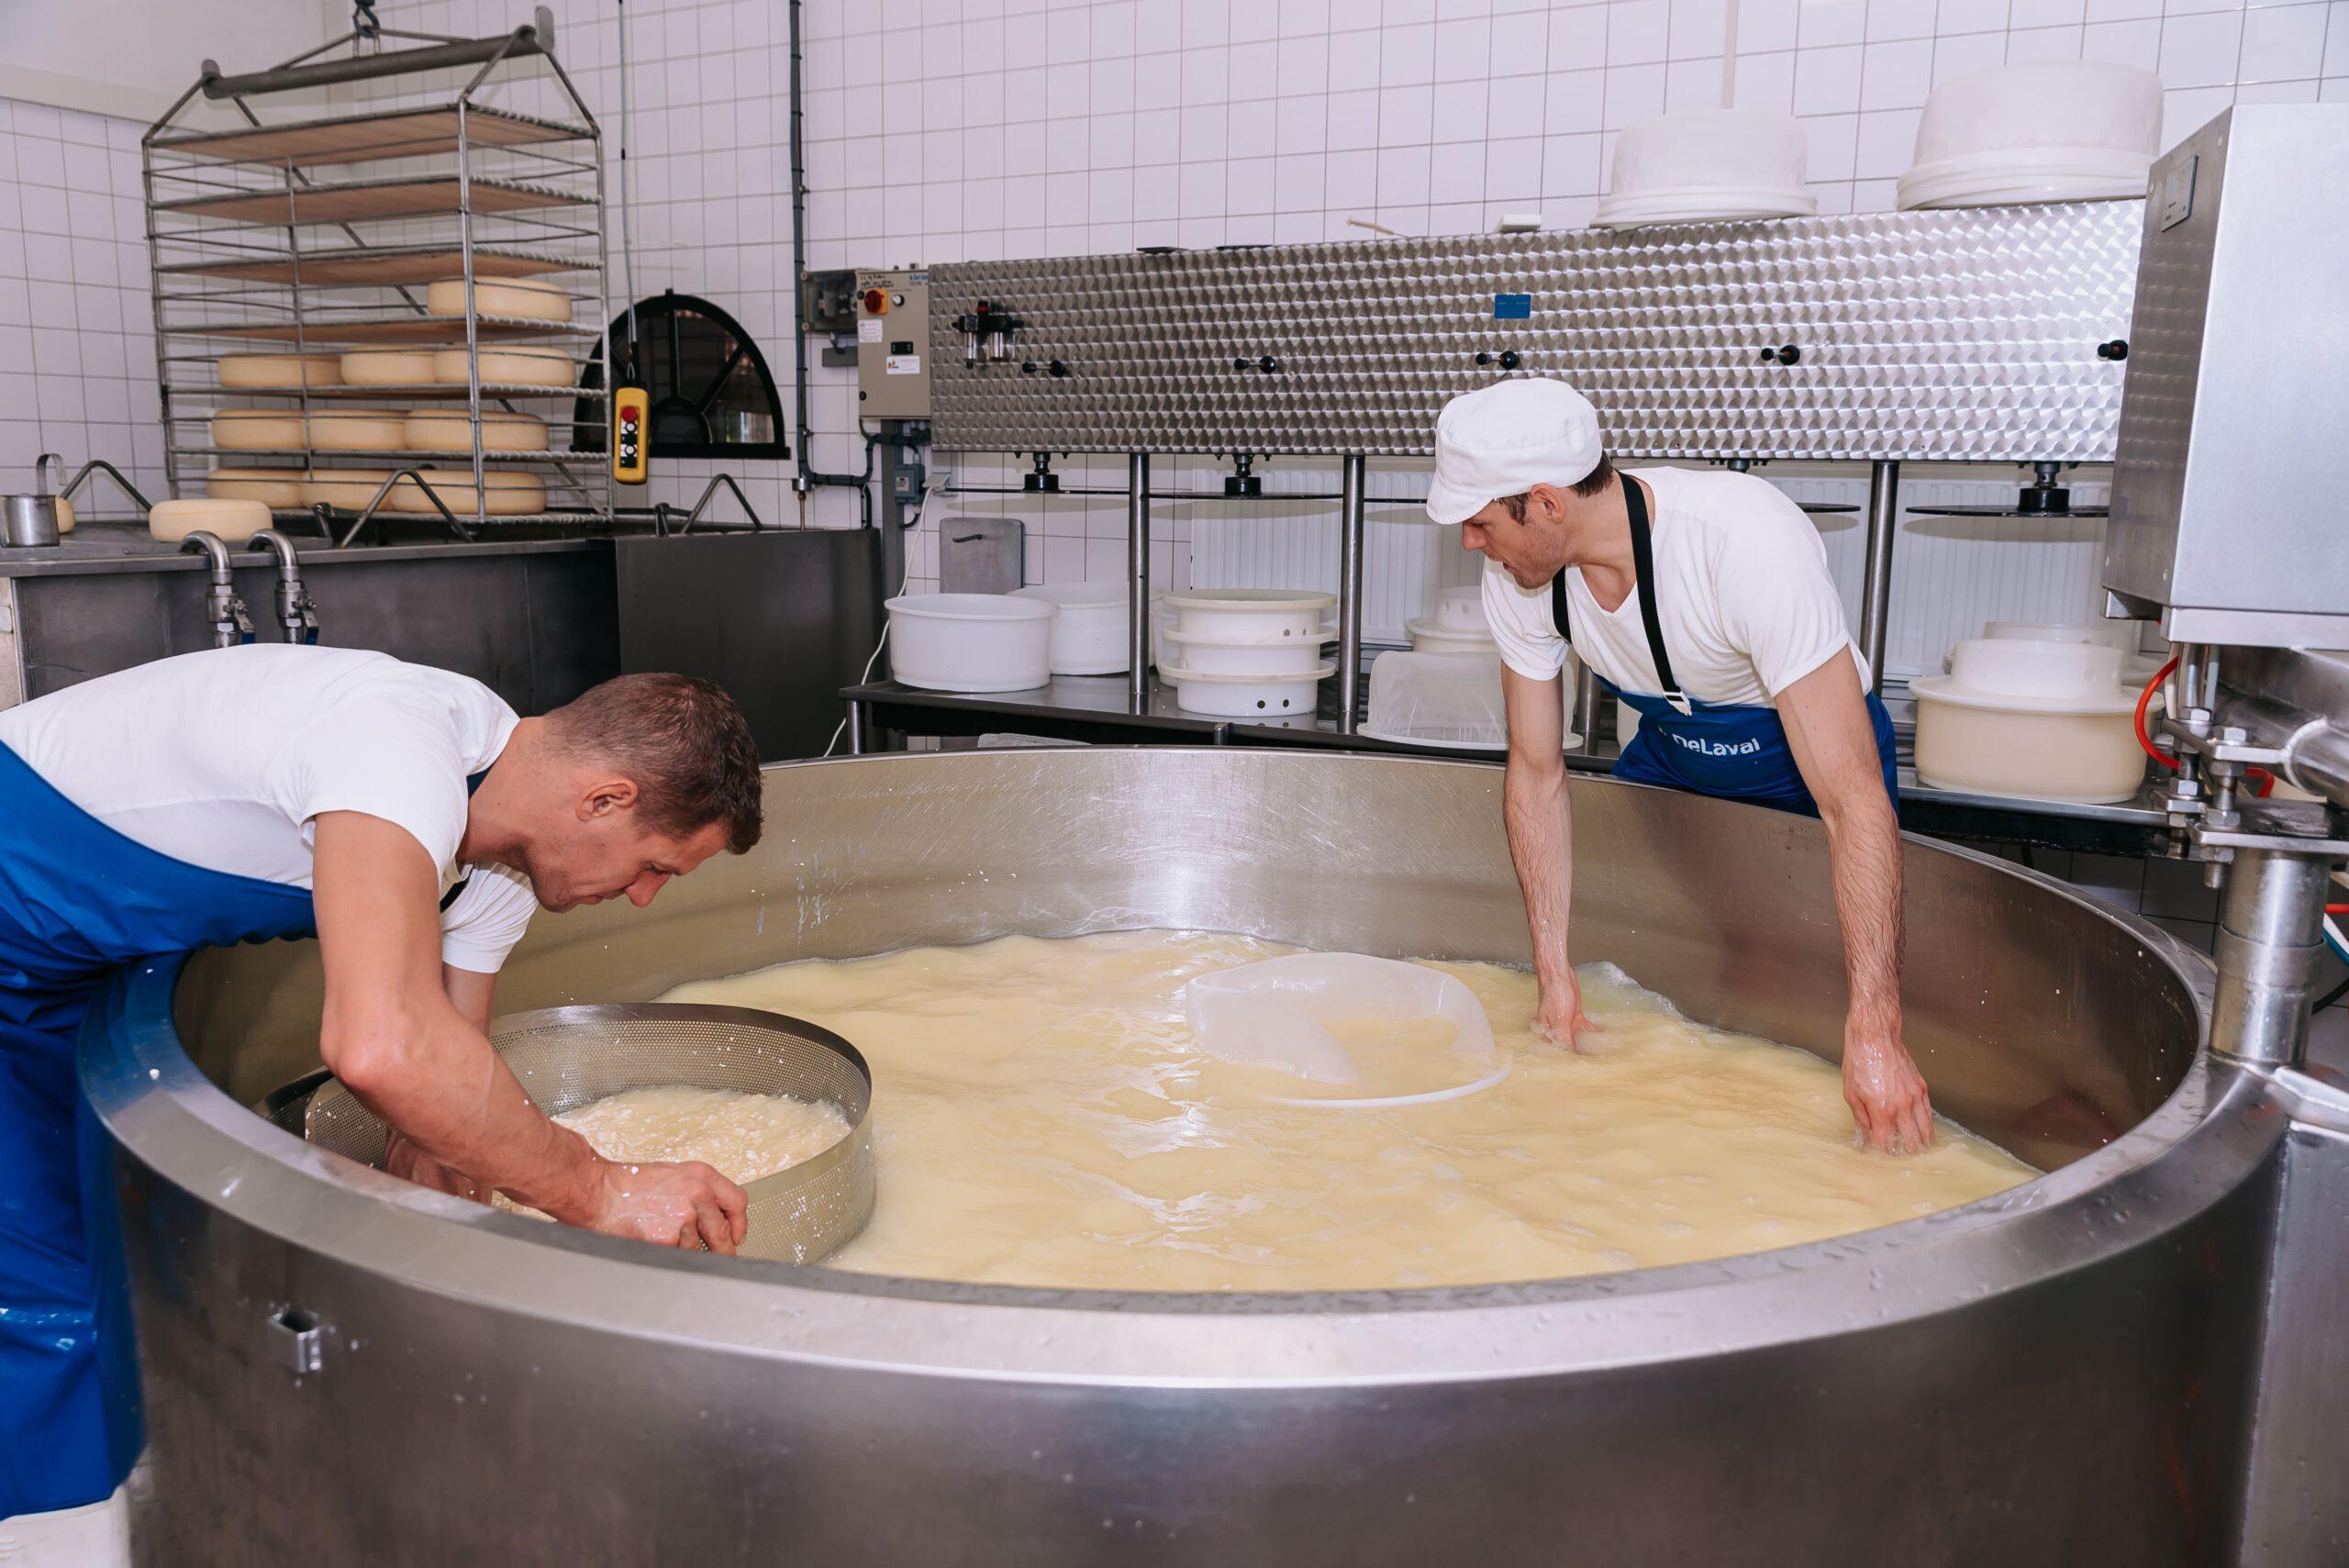 Kaasboerderij Speksnijder | Kaas maken| Online Kaaswinkel